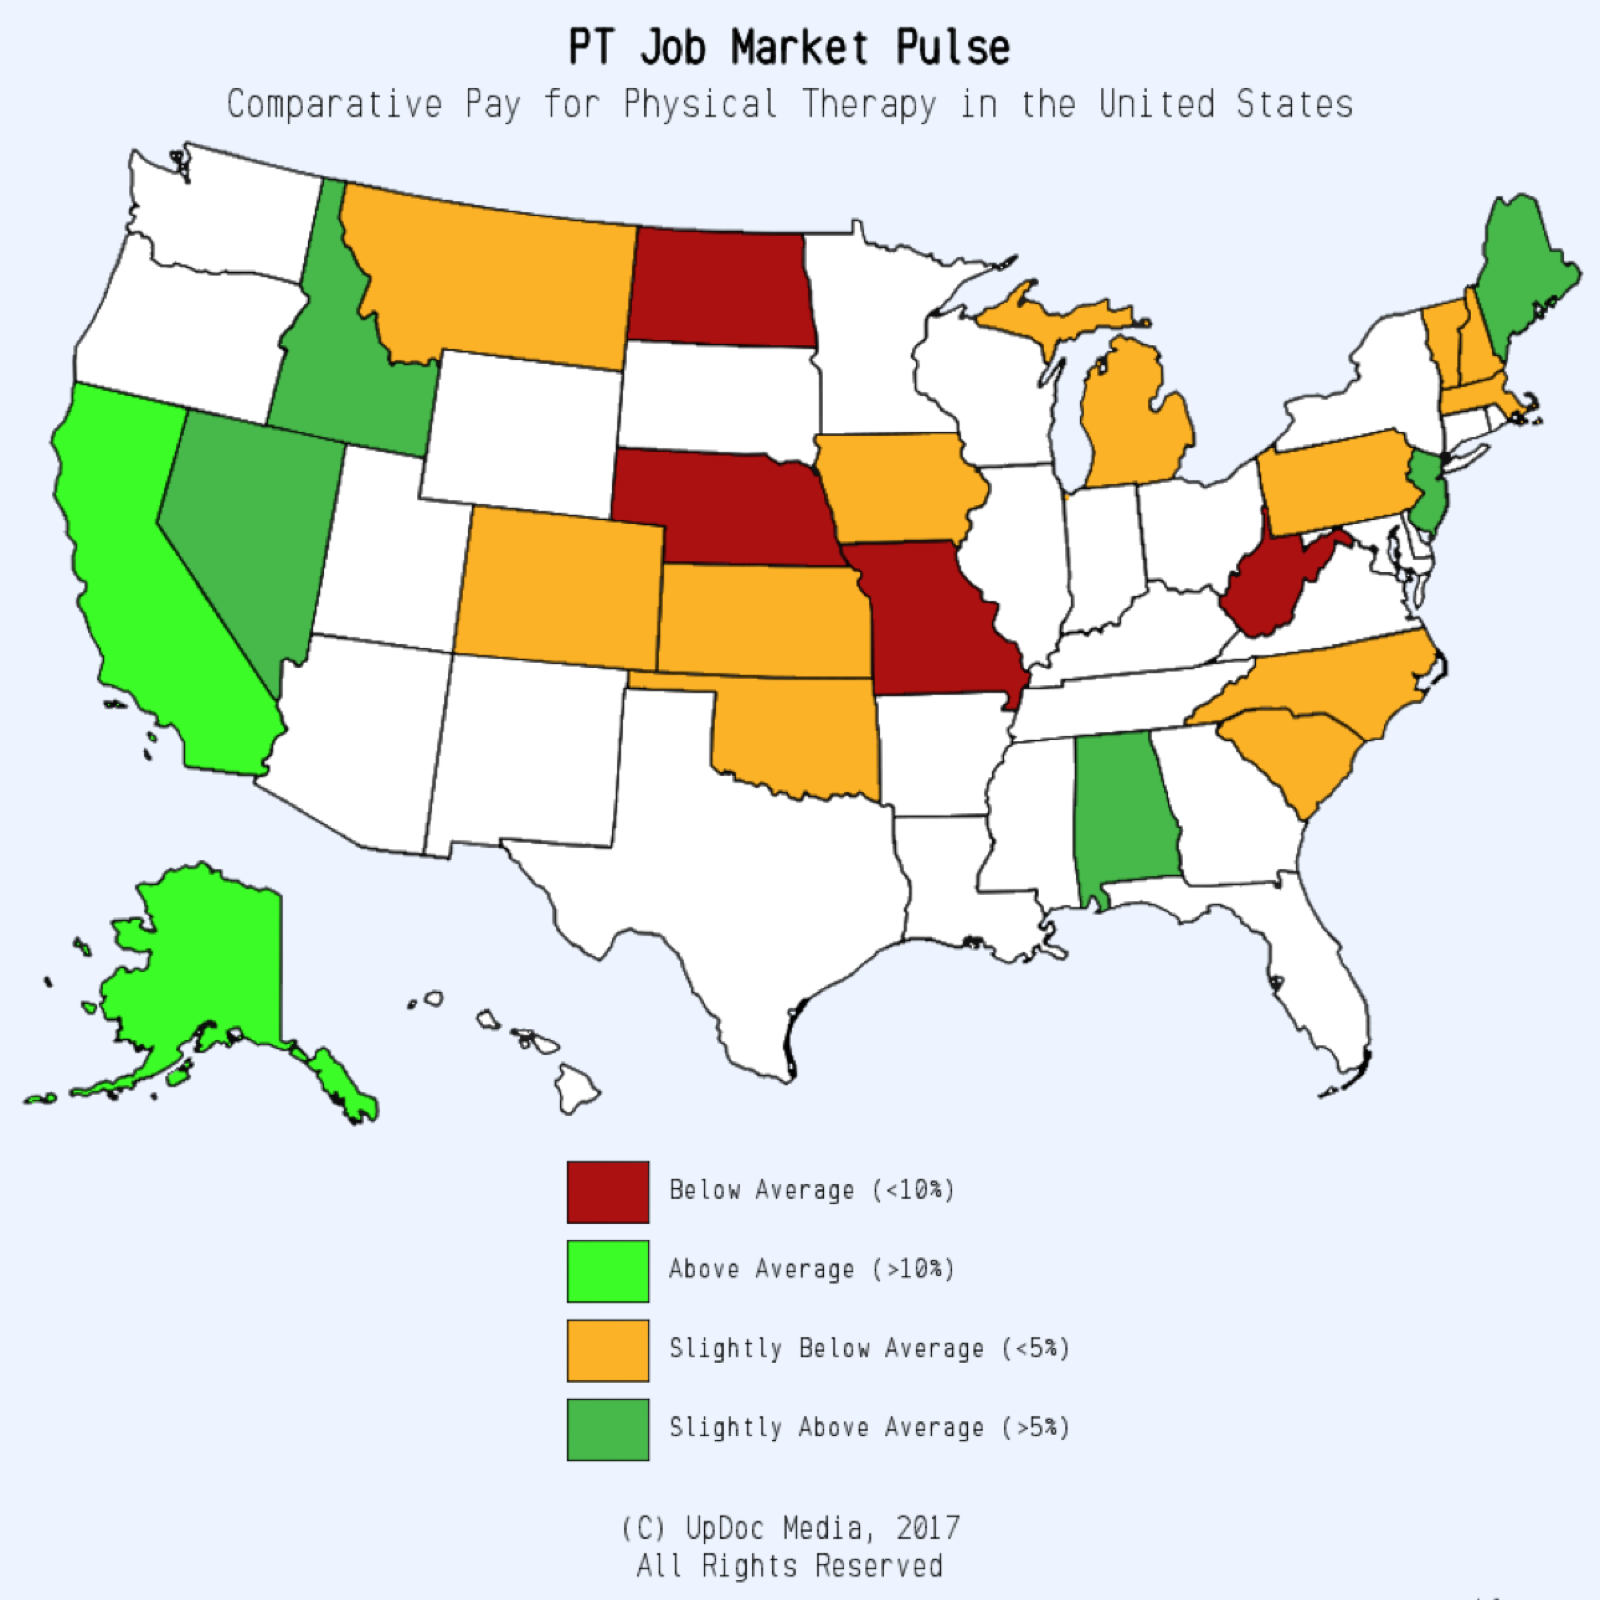 pt job market pulse 2017 - year one - updoc media, Human Body